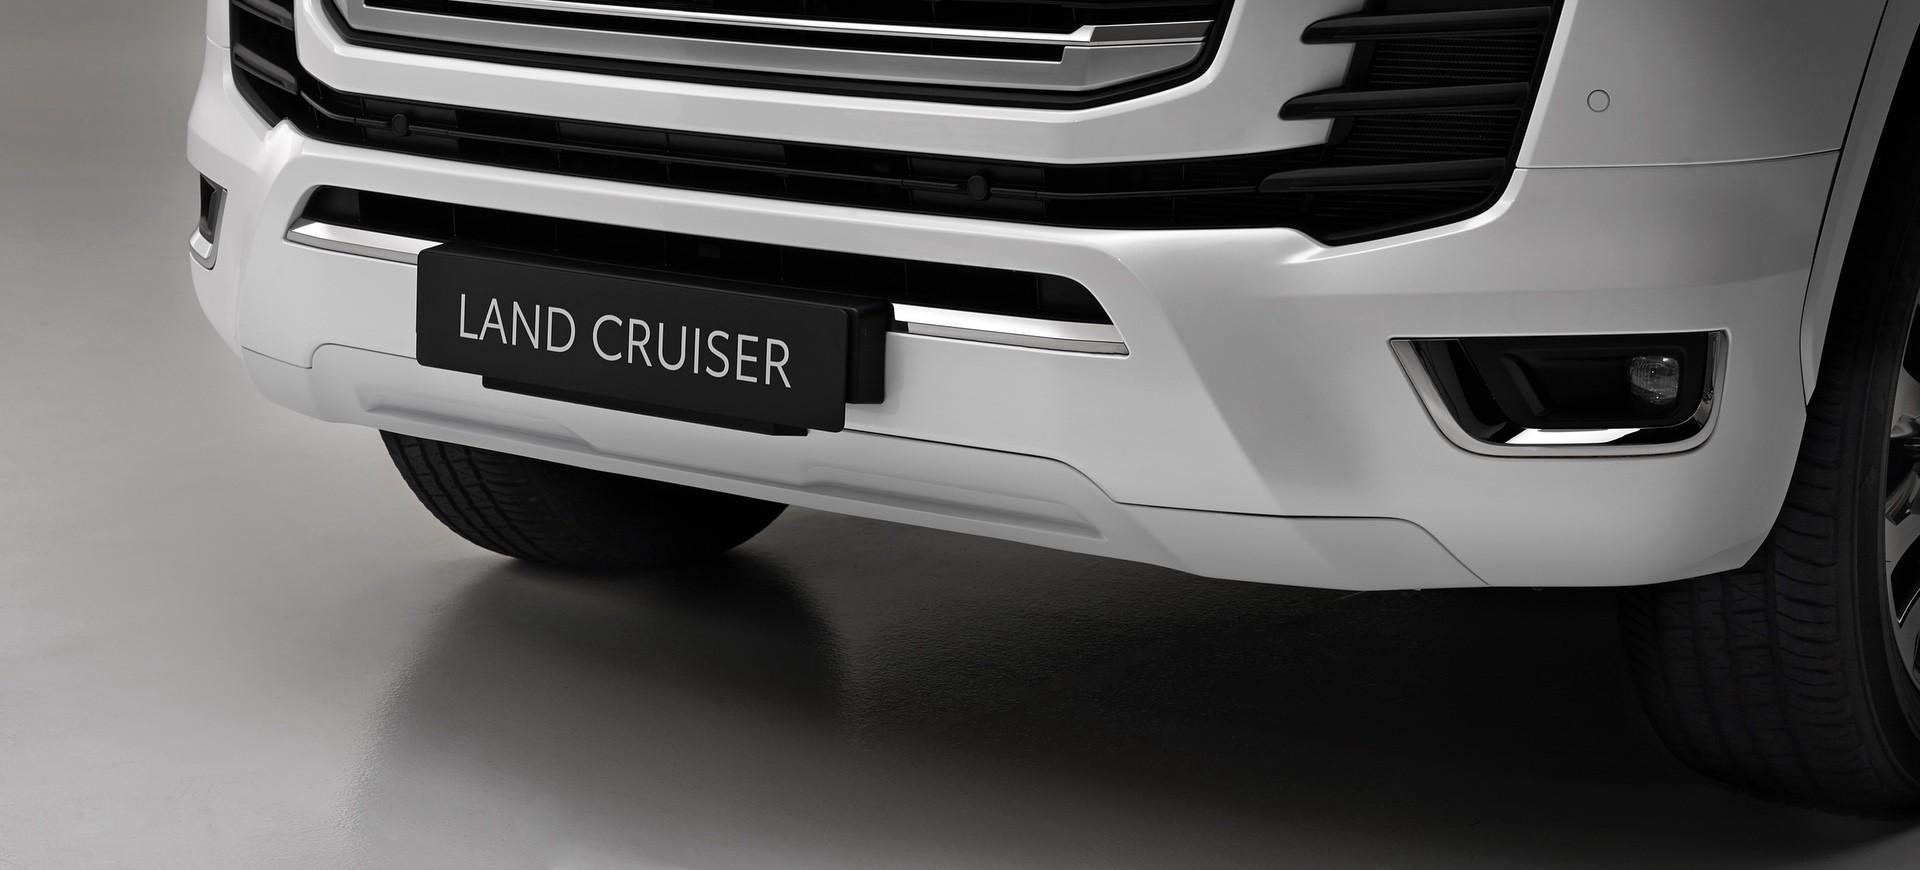 2021_Toyota_Land_Cruiser-0010